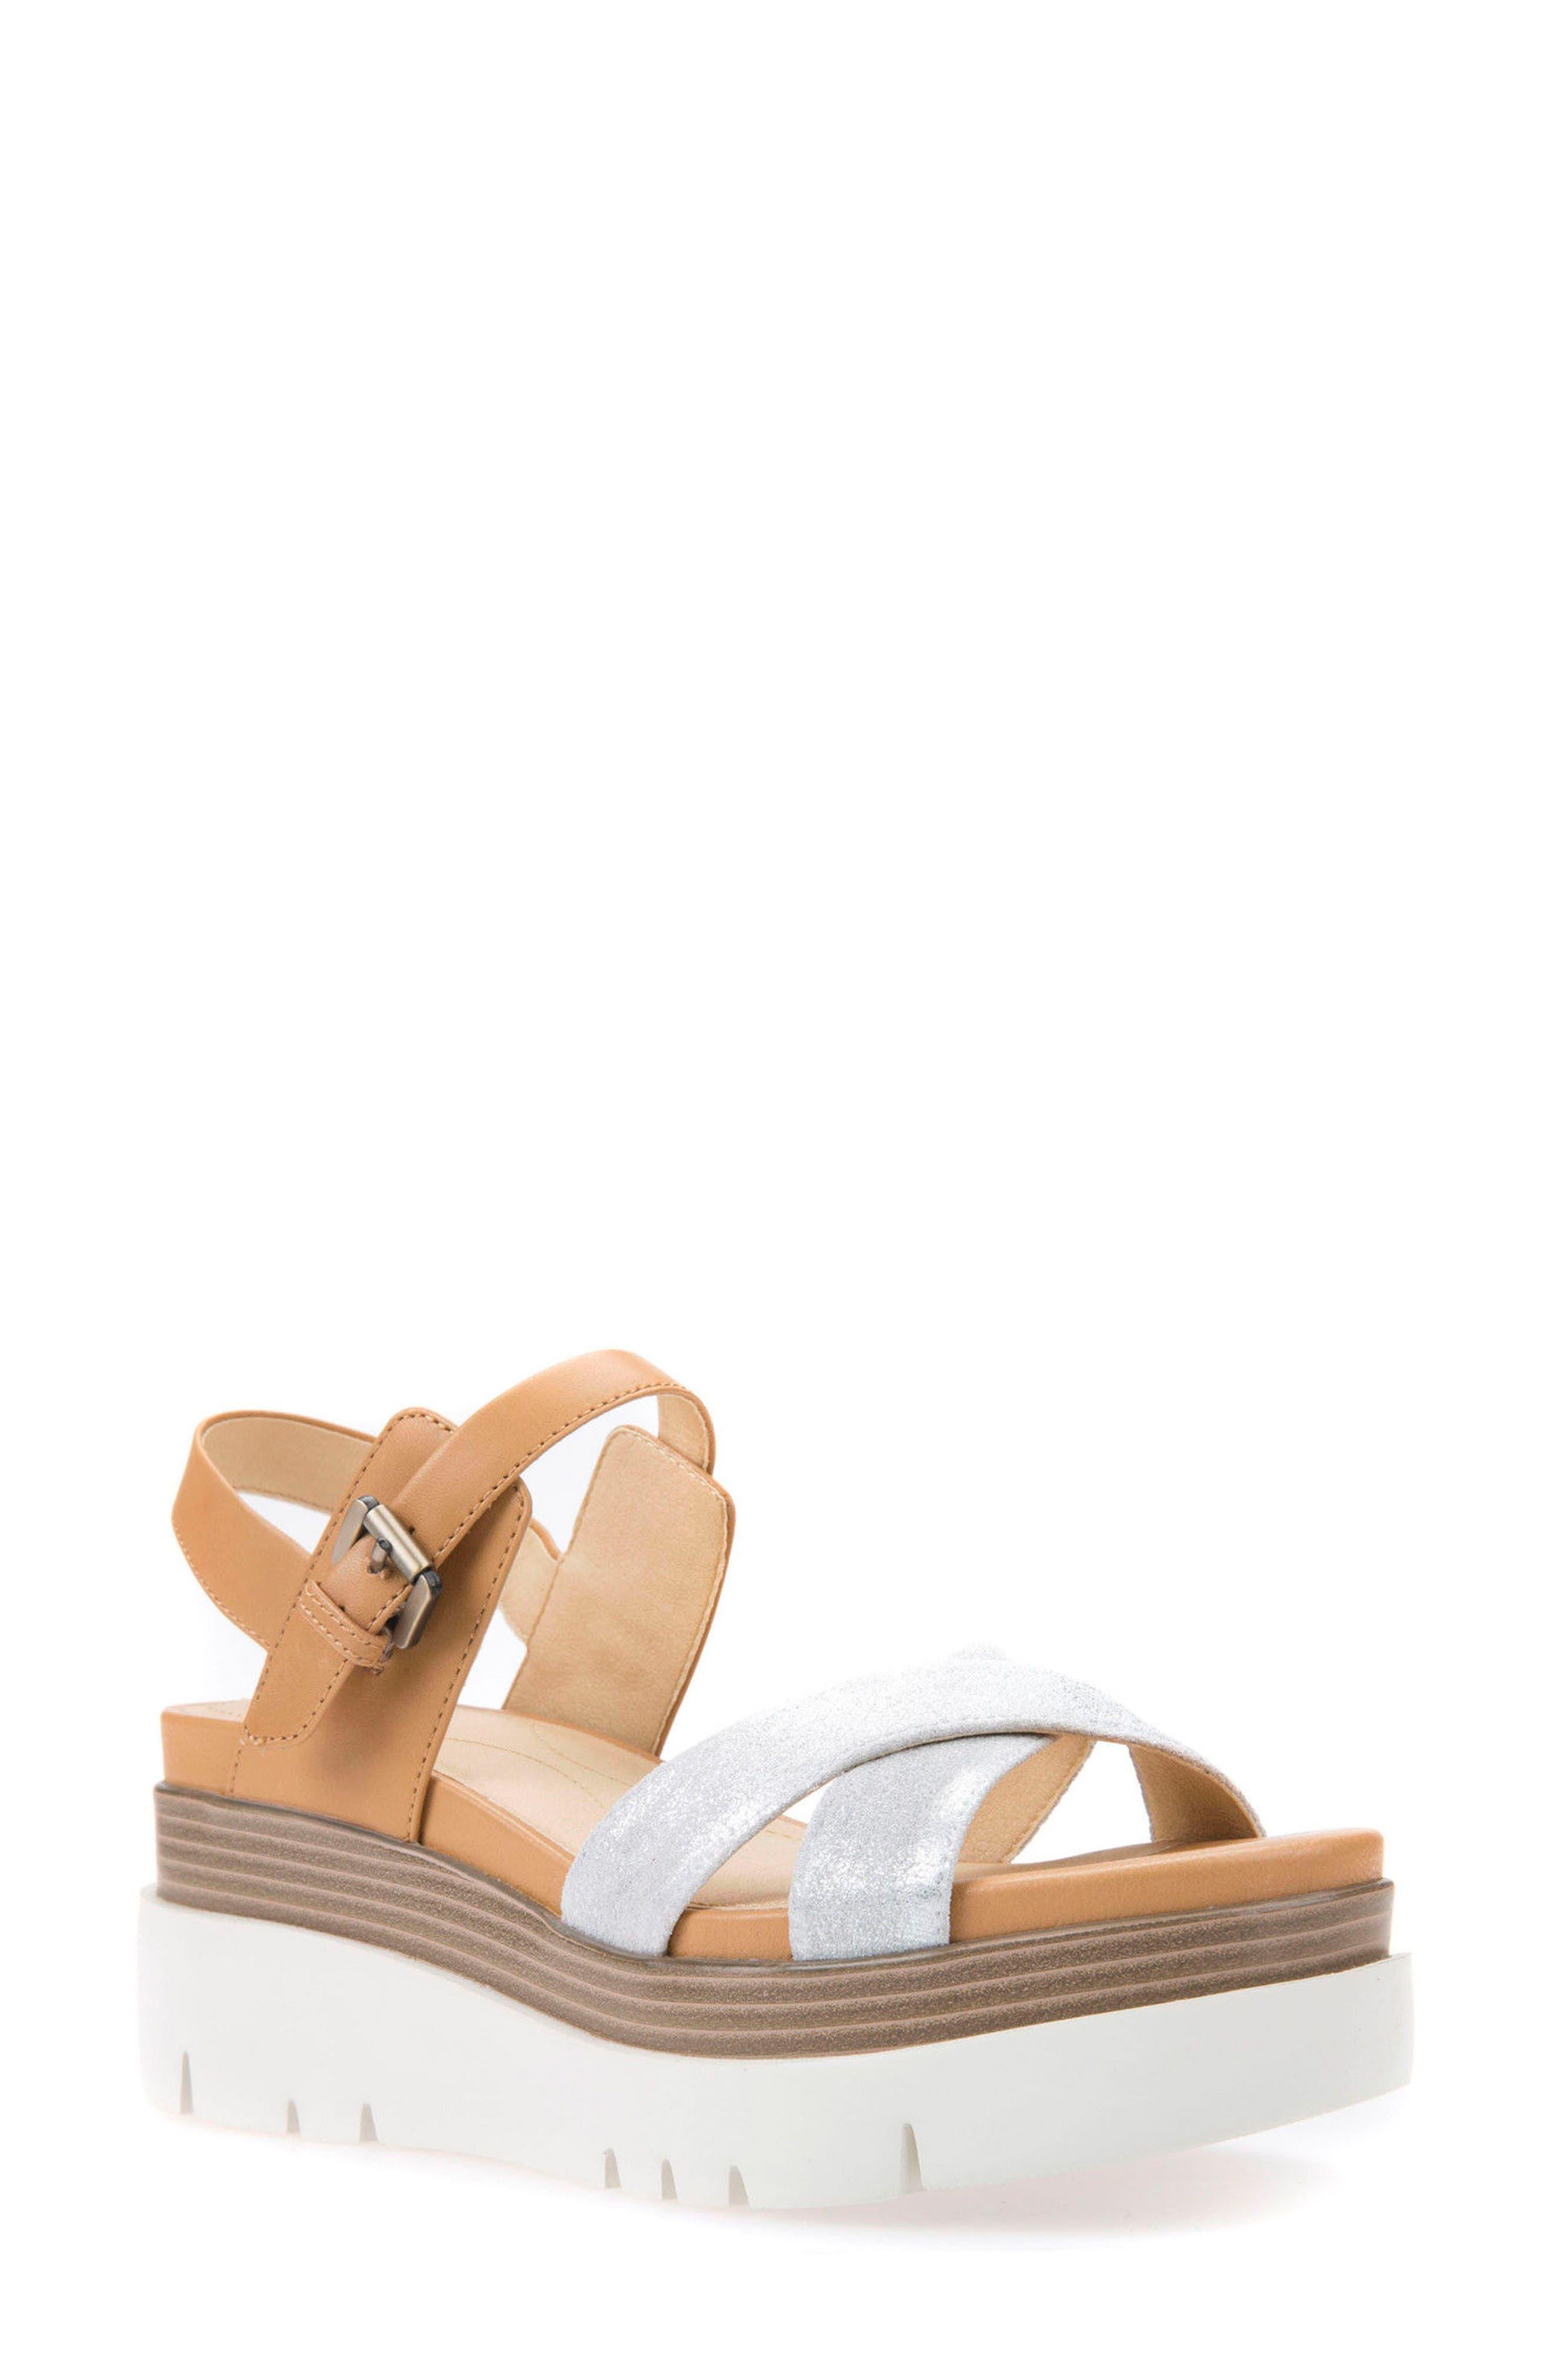 Radwa Platform Sandal,                             Main thumbnail 1, color,                             Off White Leather